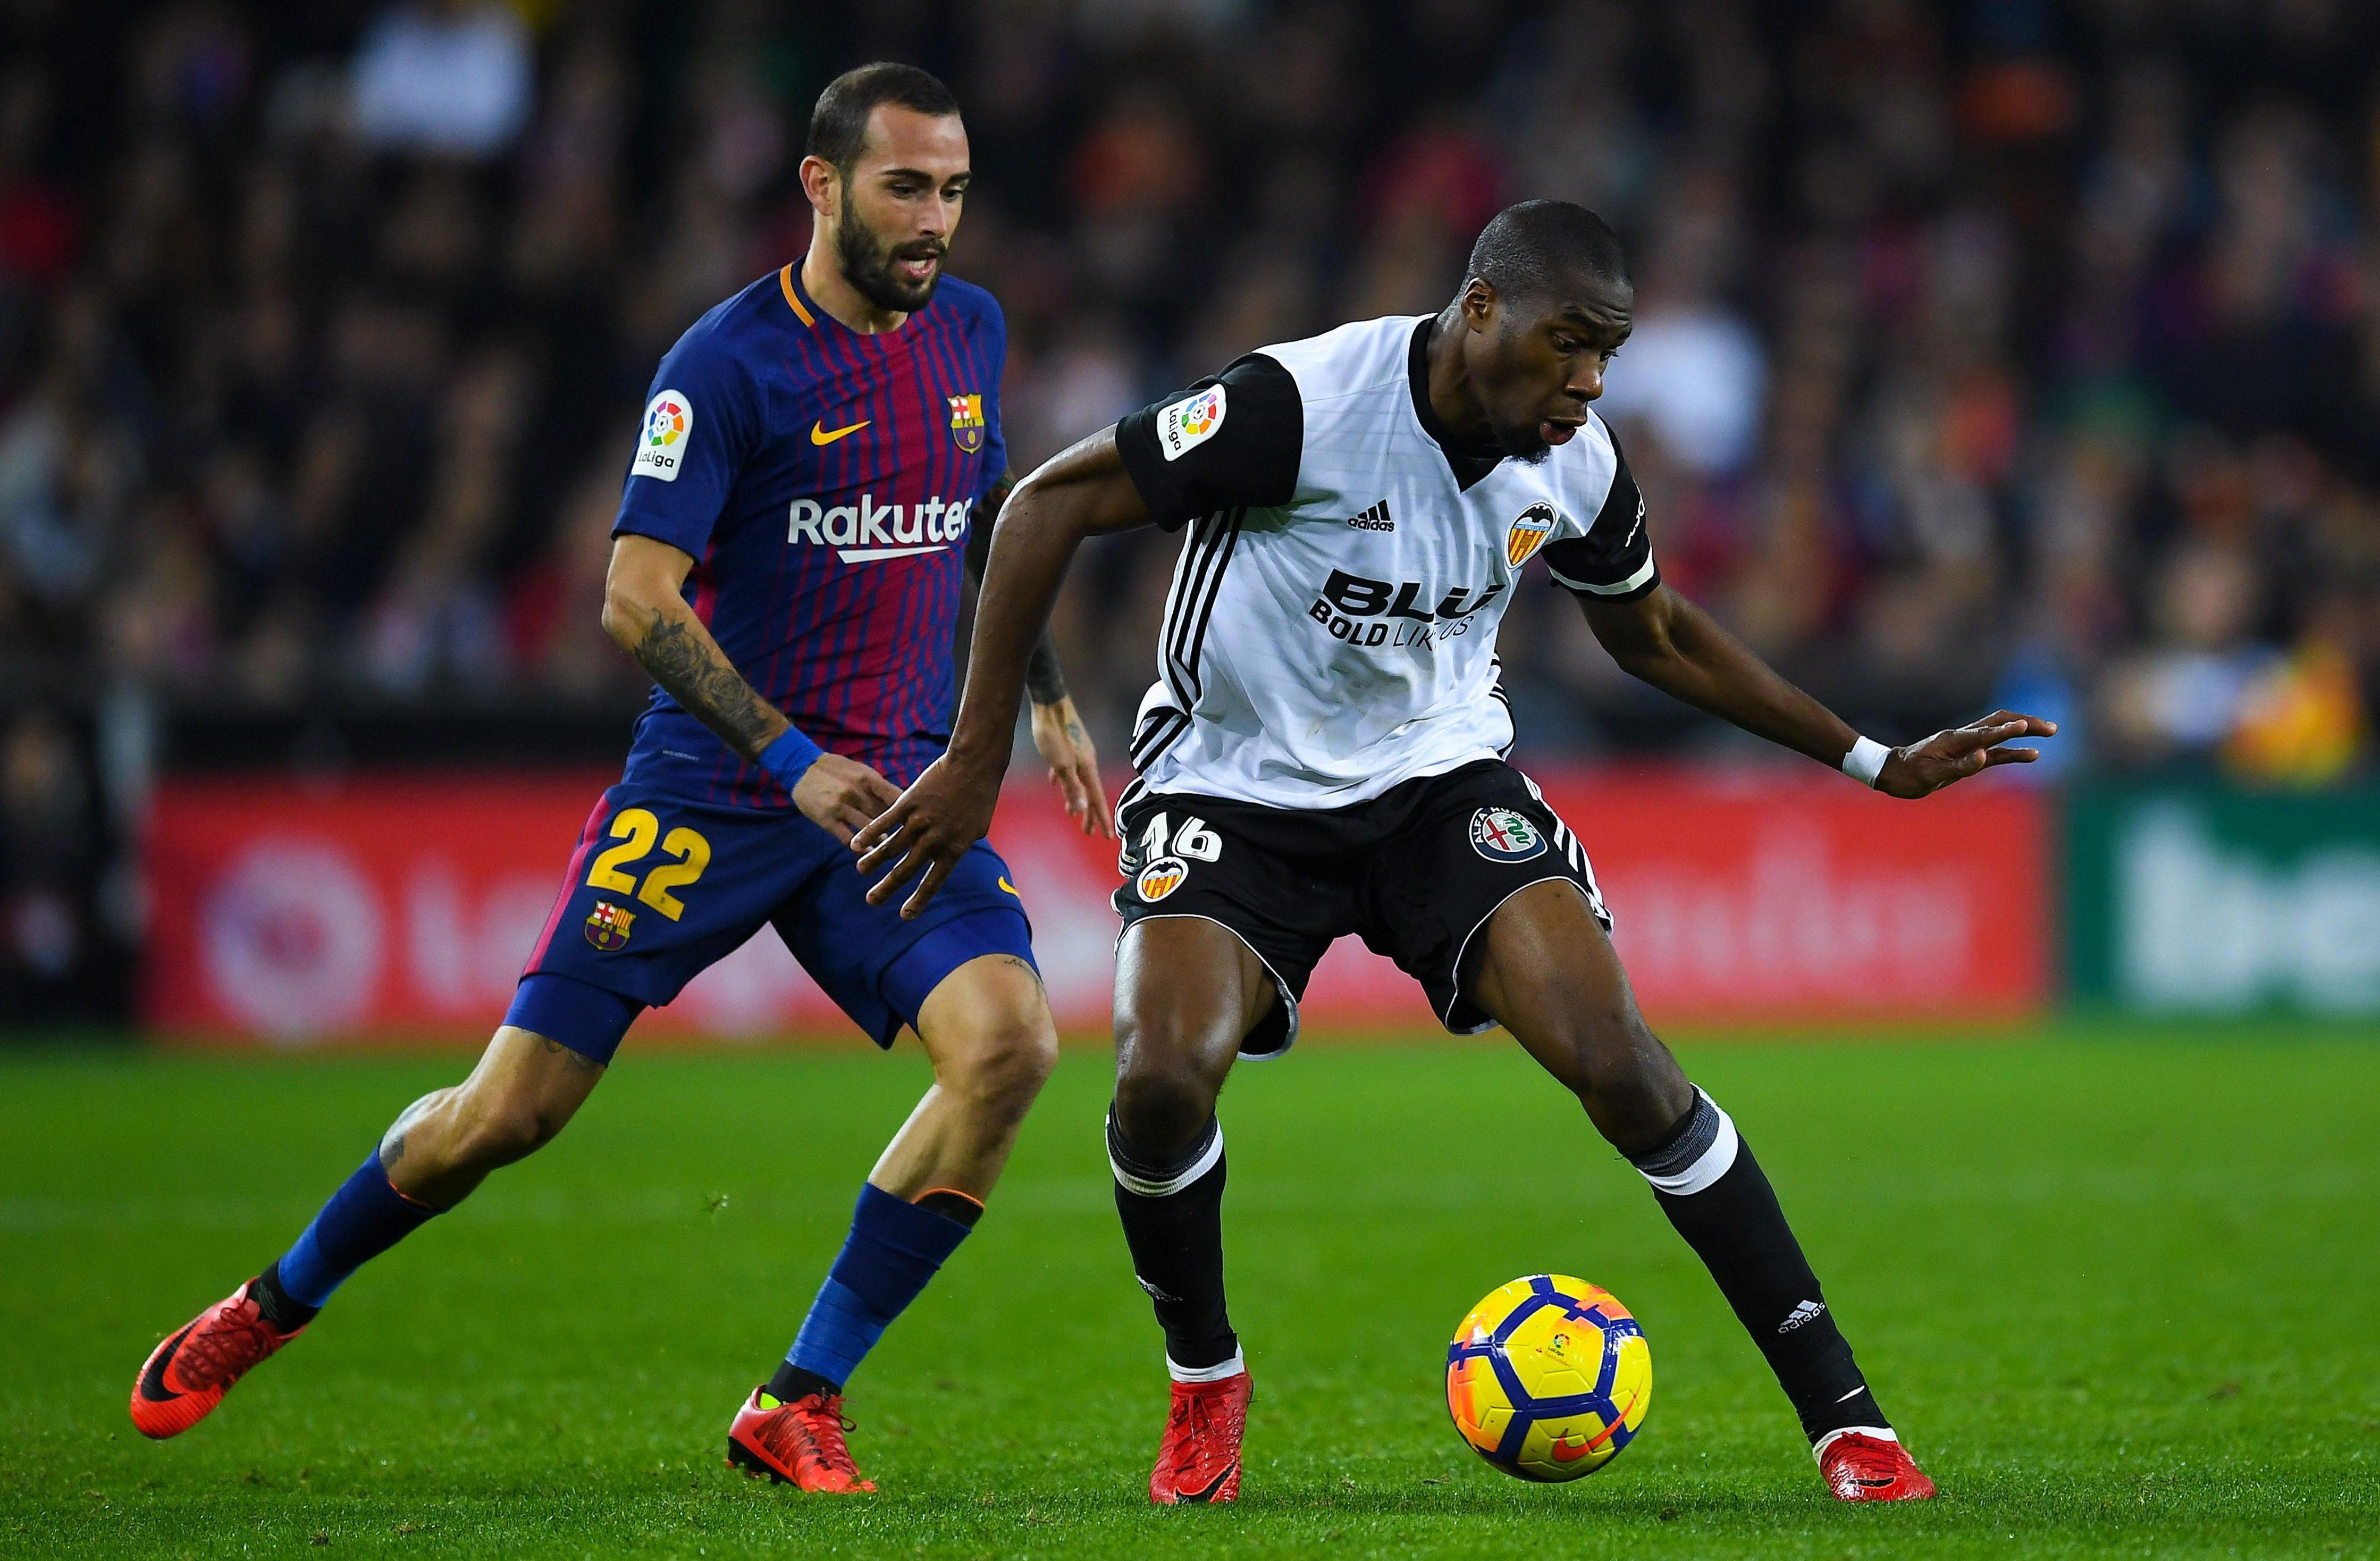 Kondogbia has helped Valencia challenge Barcelona at the top of La Liga this season